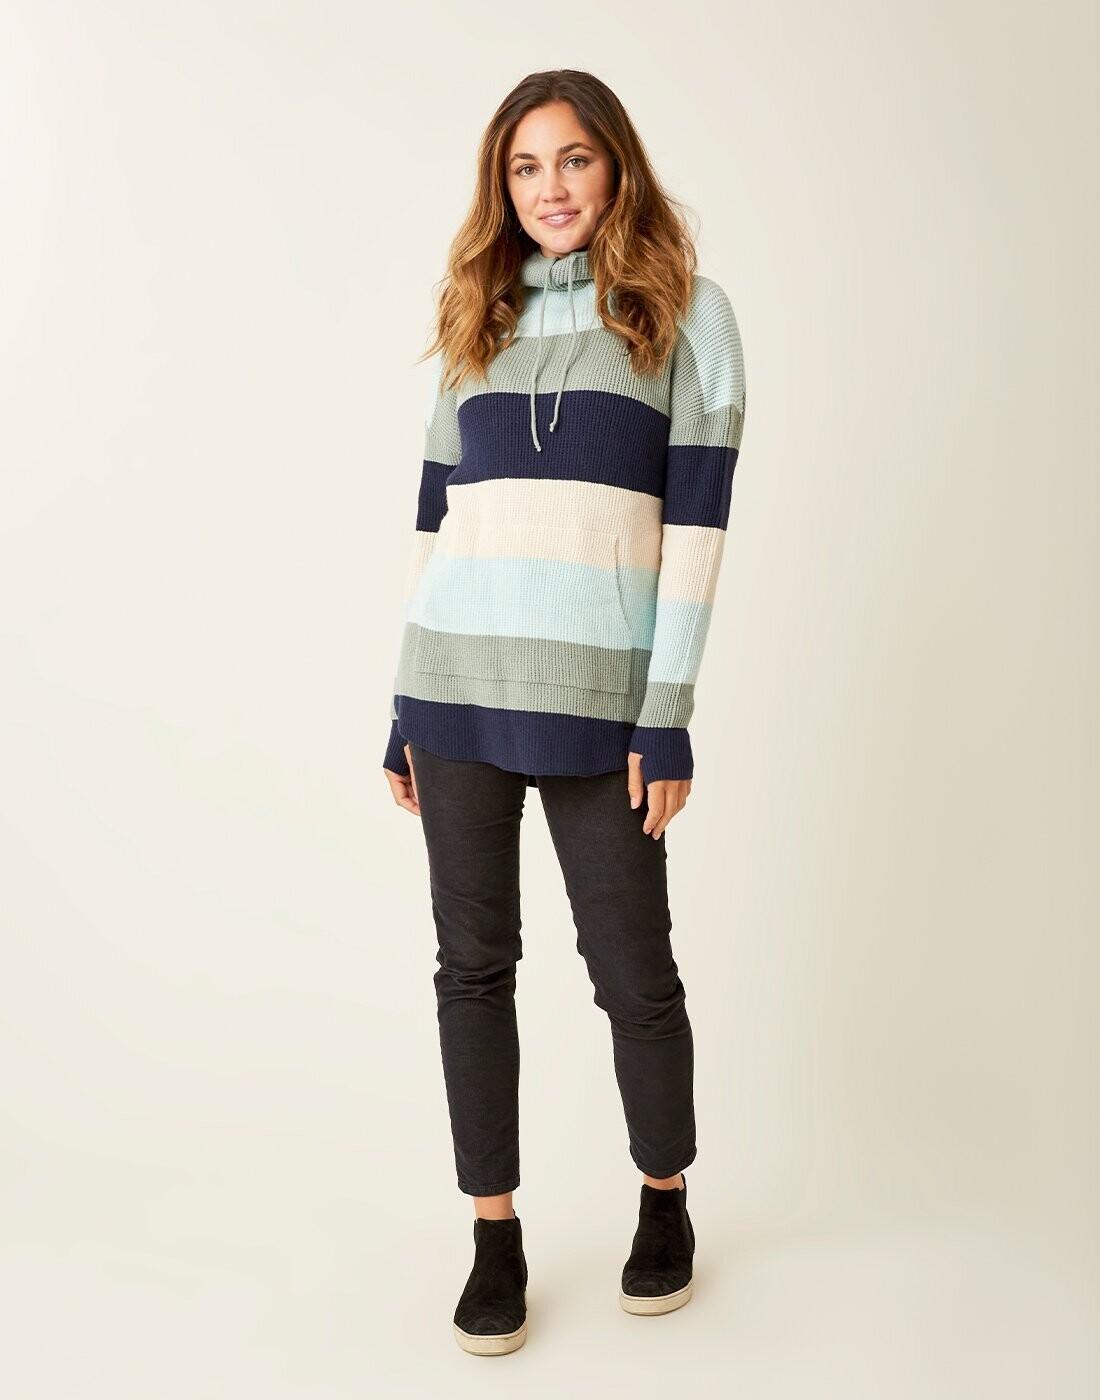 Carve Designs, Rockvale Sweater, Thyme Bold Stripe